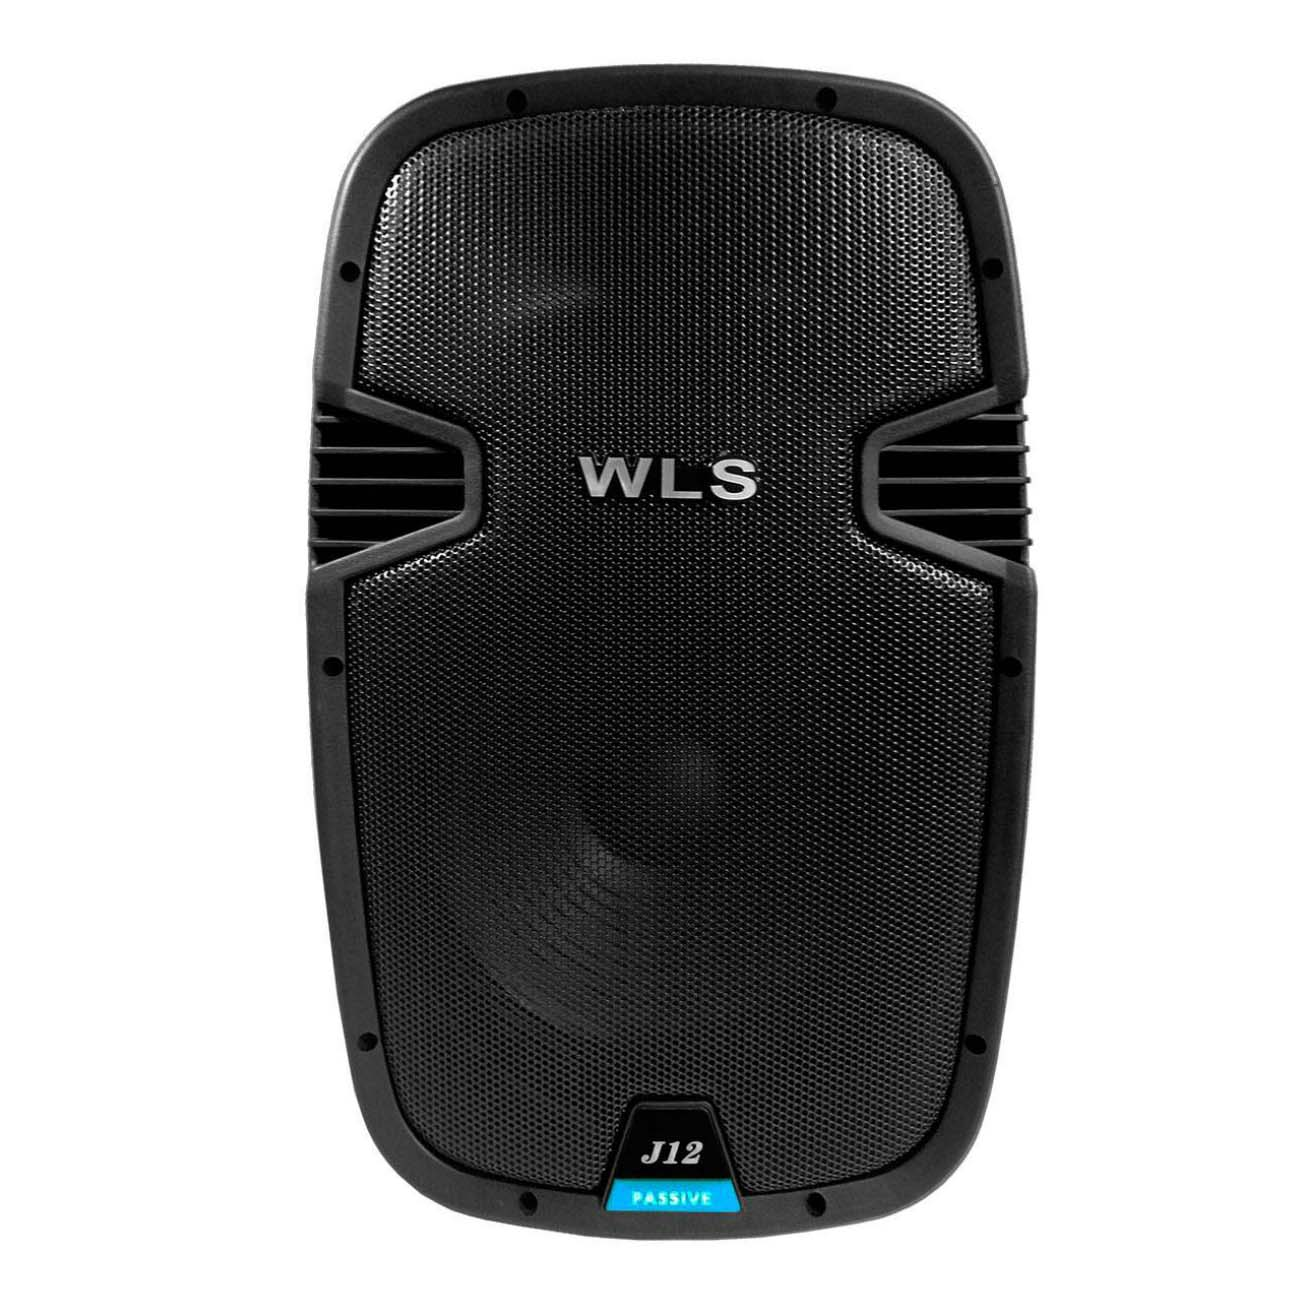 Caixa Acústica Passiva WLS J12 Pro 12